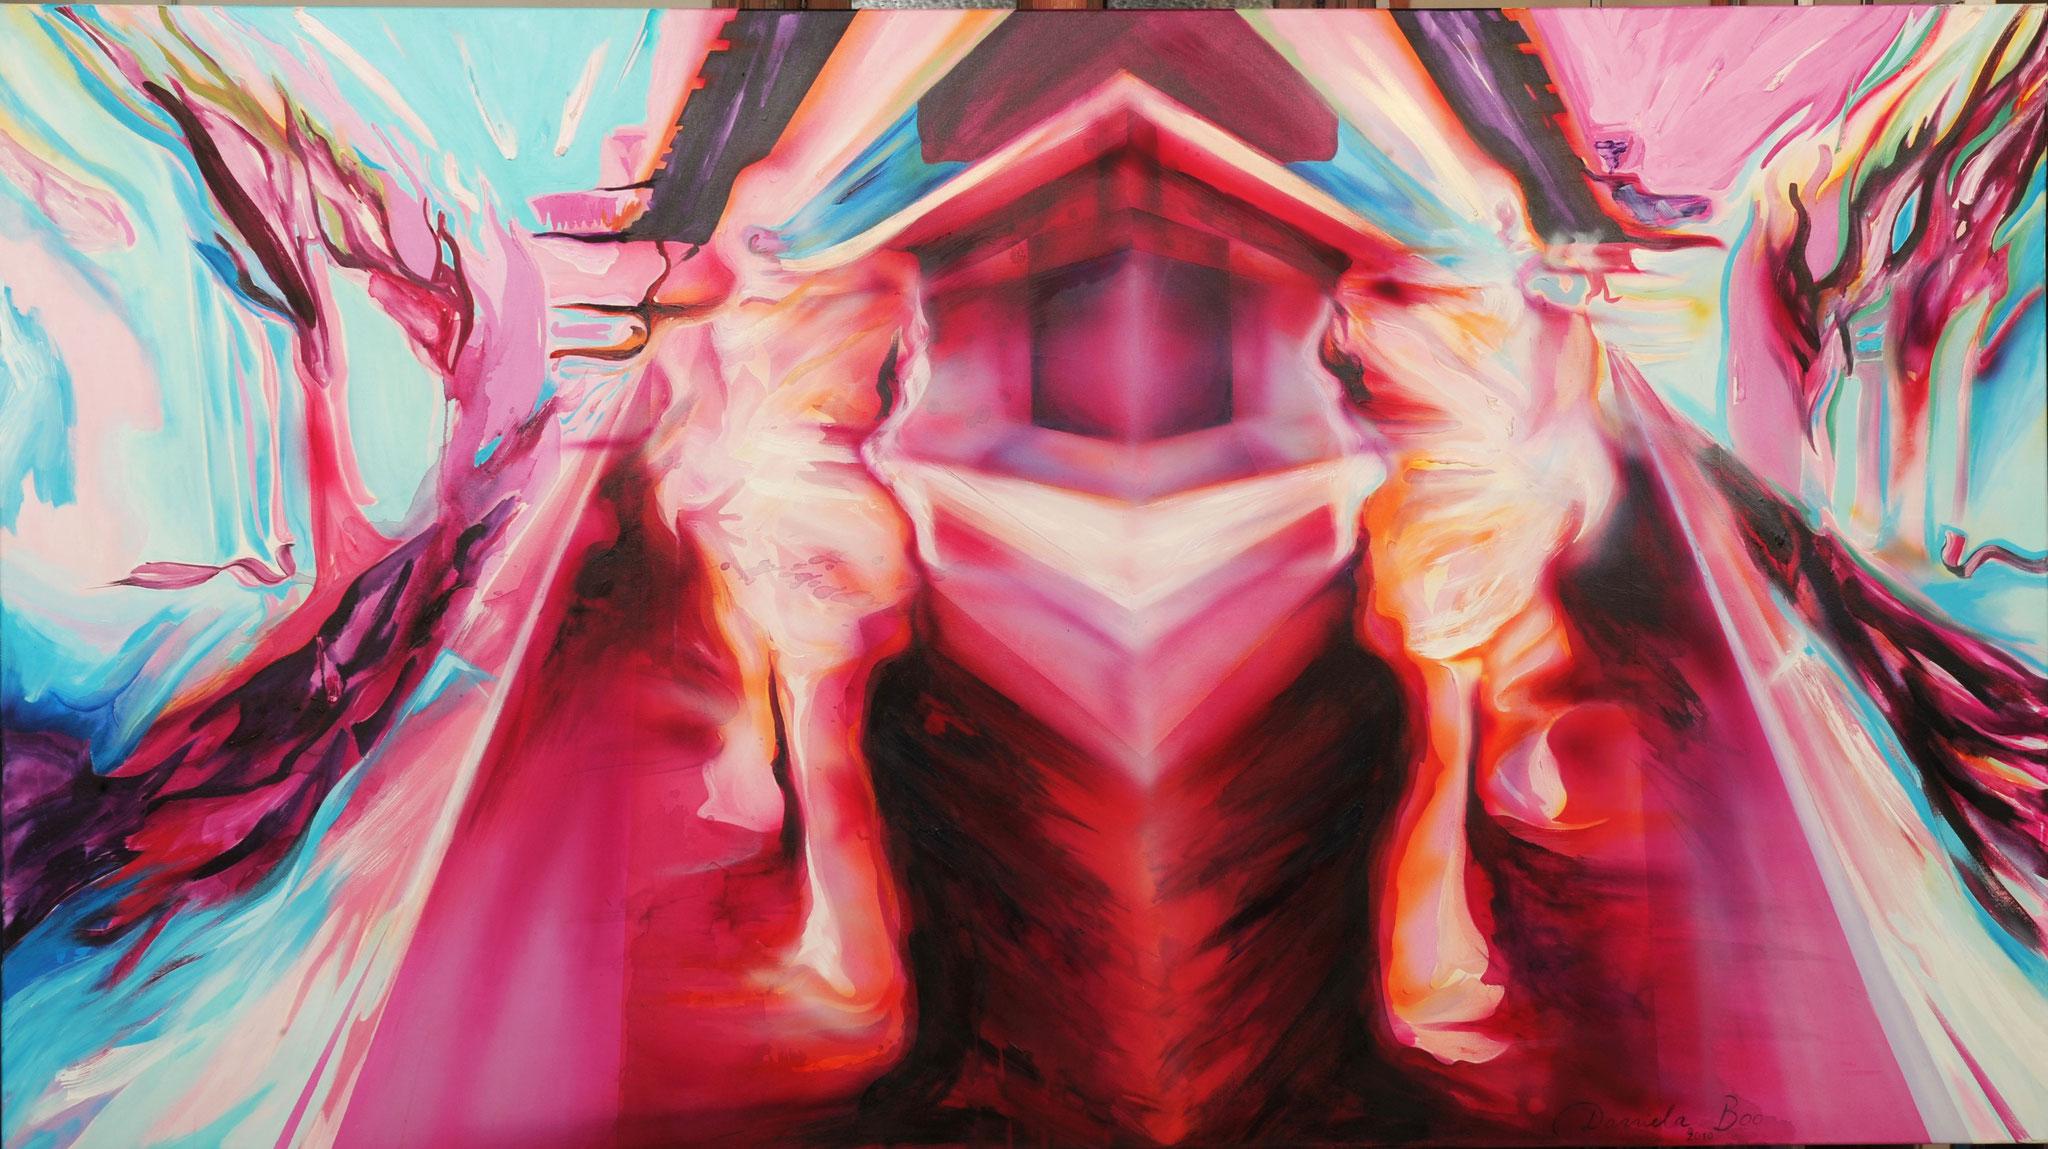 Double Motion III 140 cm x 250 cm Acryl auf Leinwand 2010